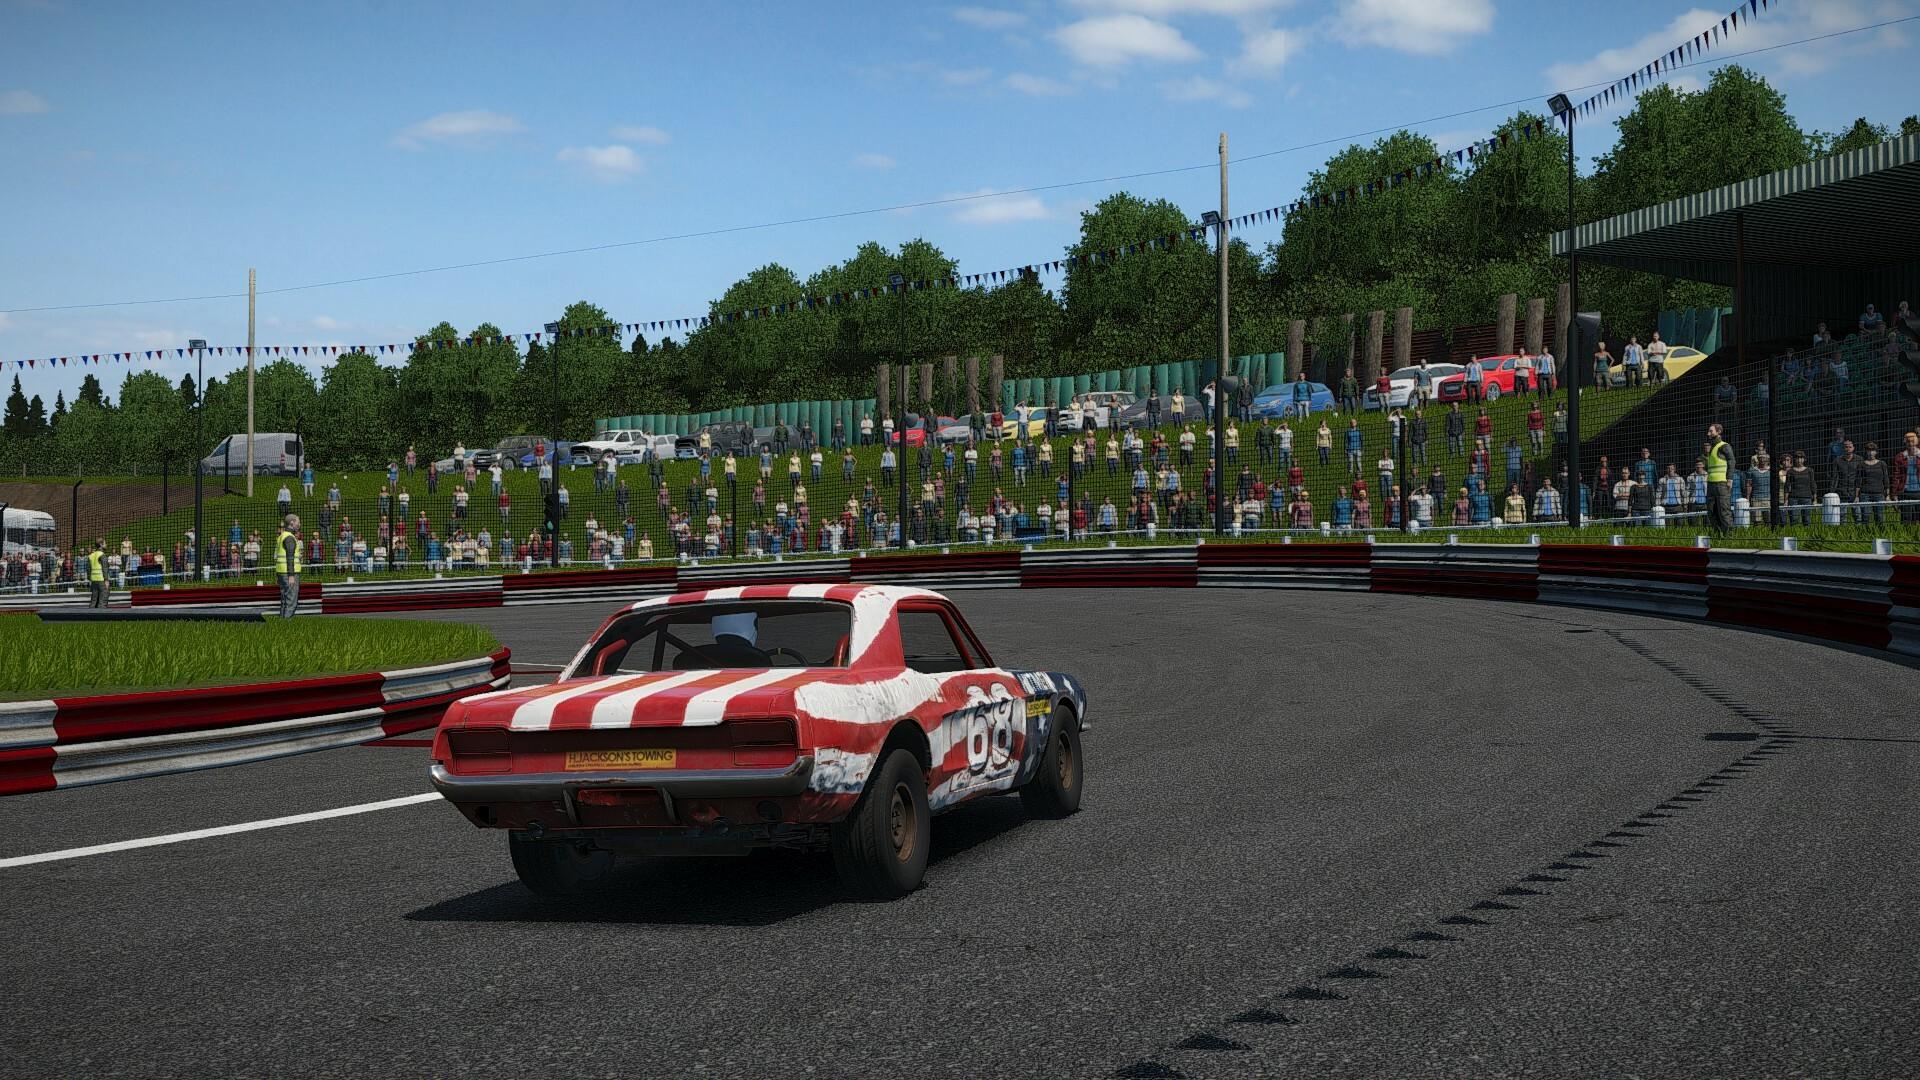 ArtStation - Hednesford Hills Raceway - Wreckfest, Mark